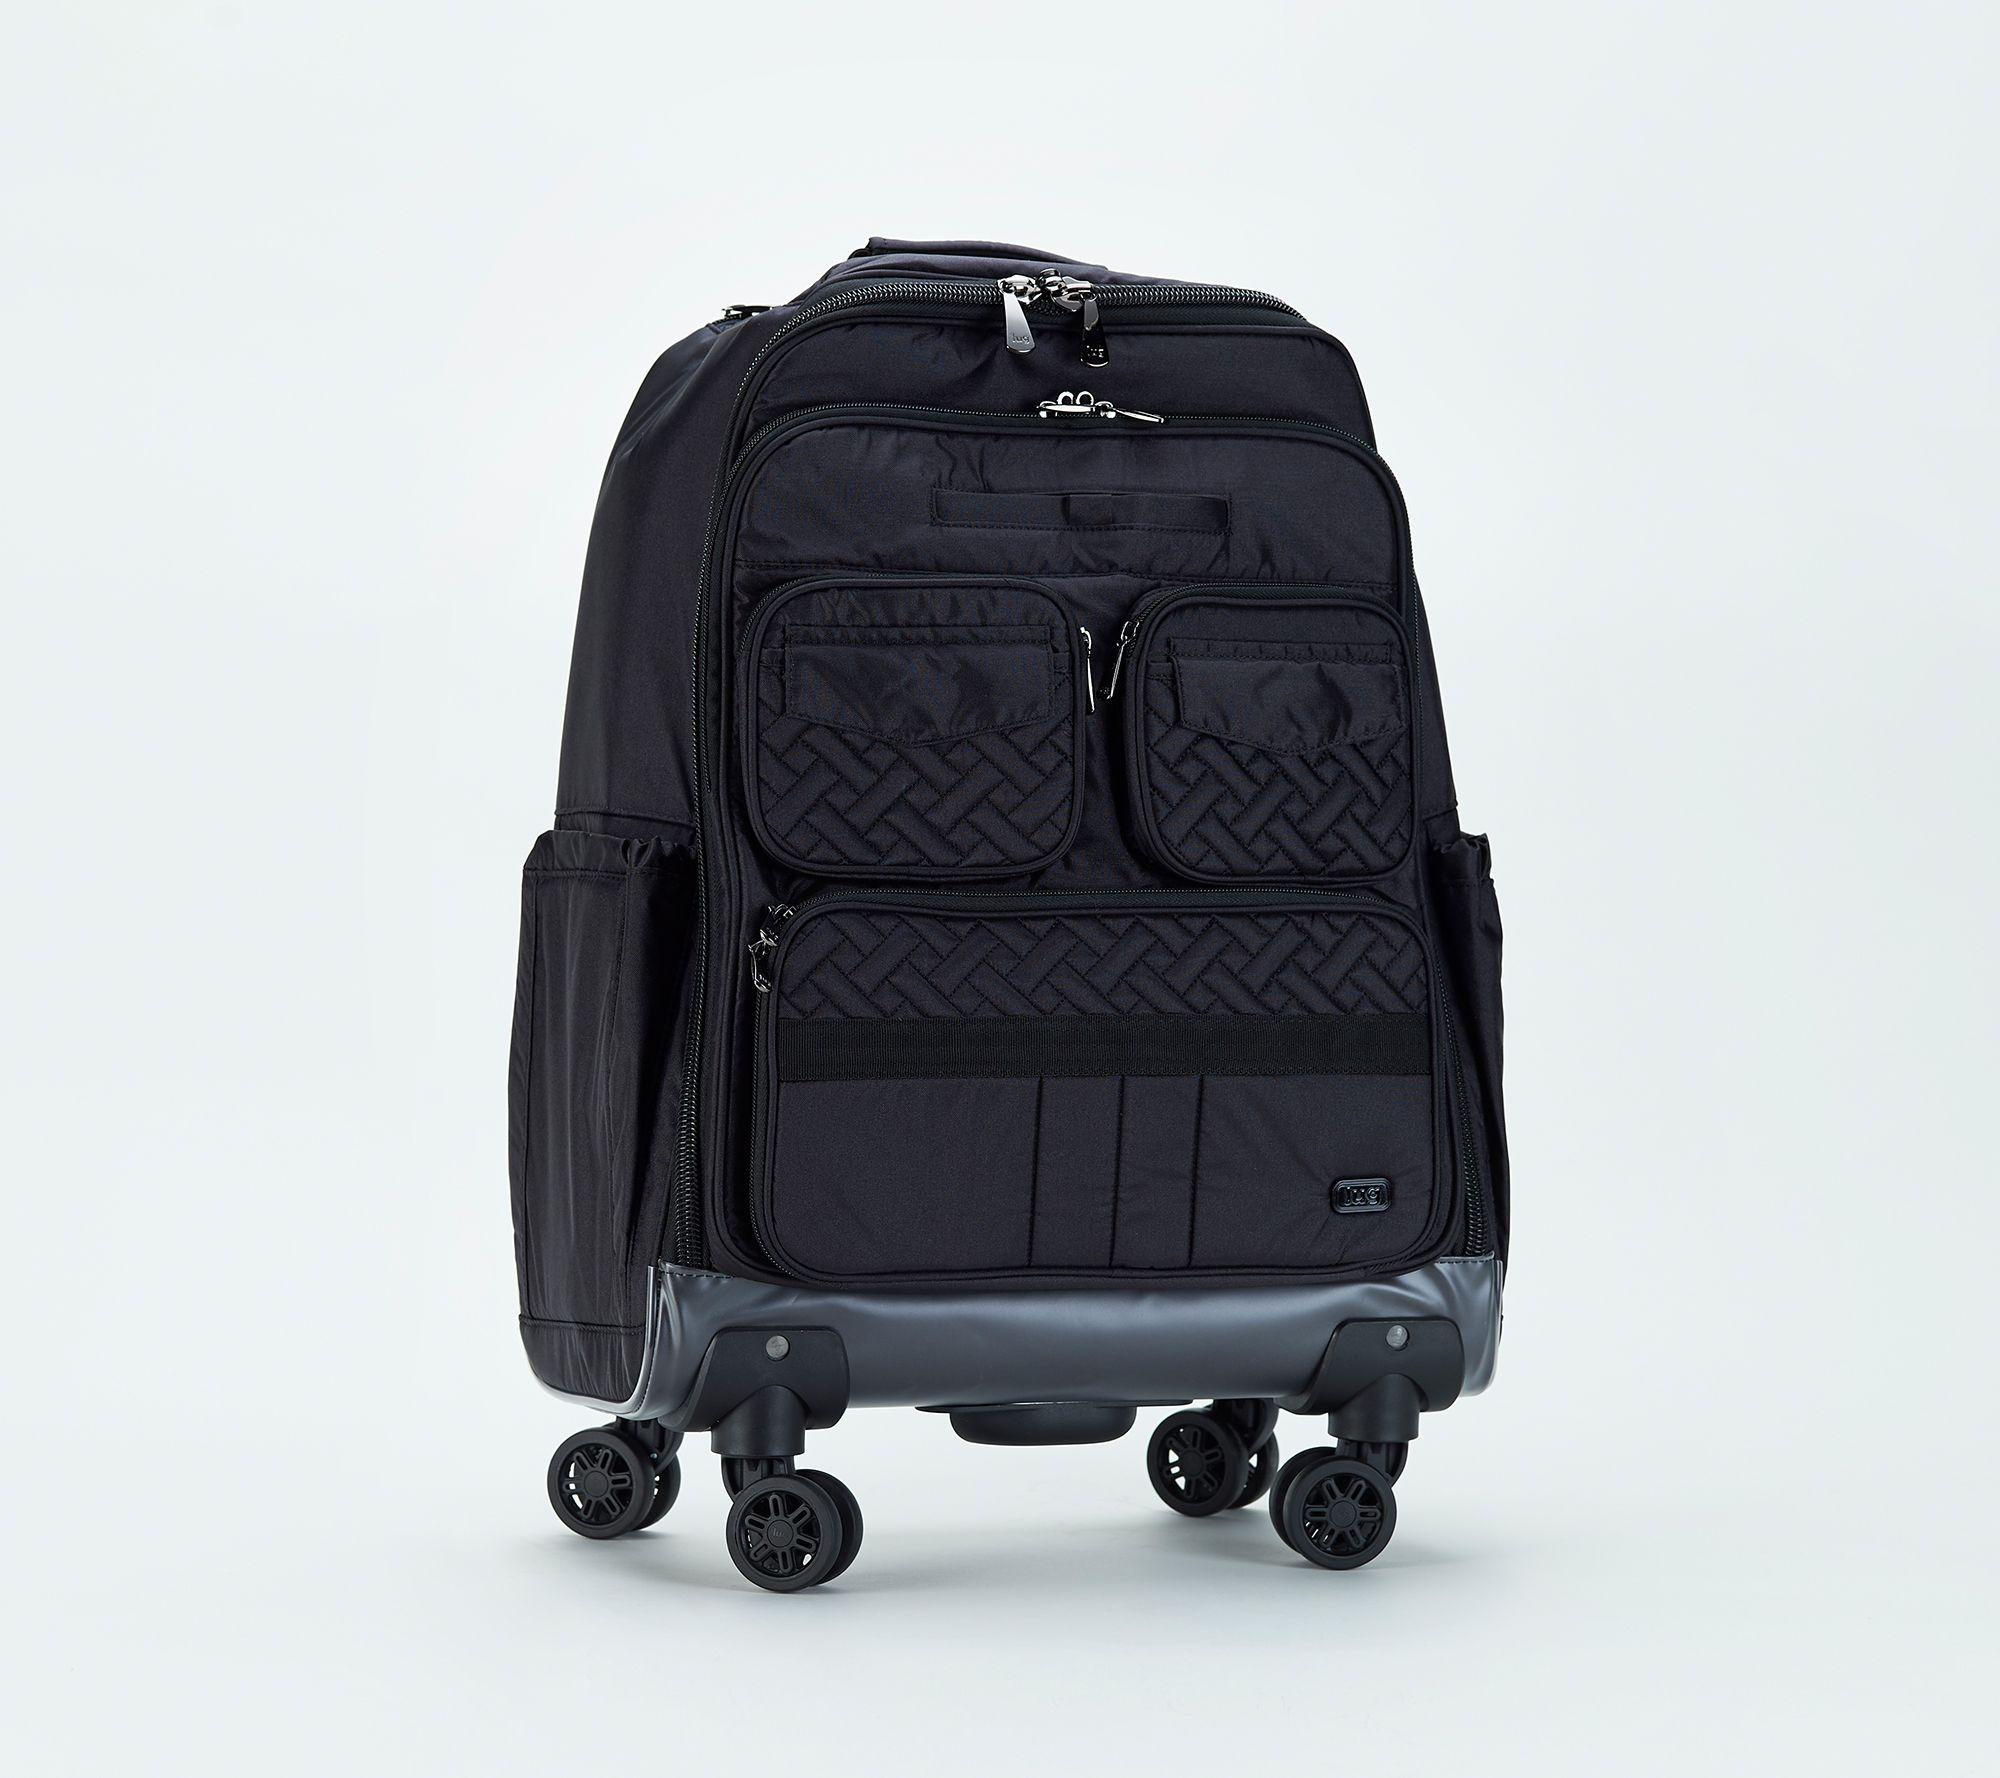 Wondrous Lug Travel Roller Bag Puddle Jumper Wheelie 2 Qvc Com Home Interior And Landscaping Ologienasavecom